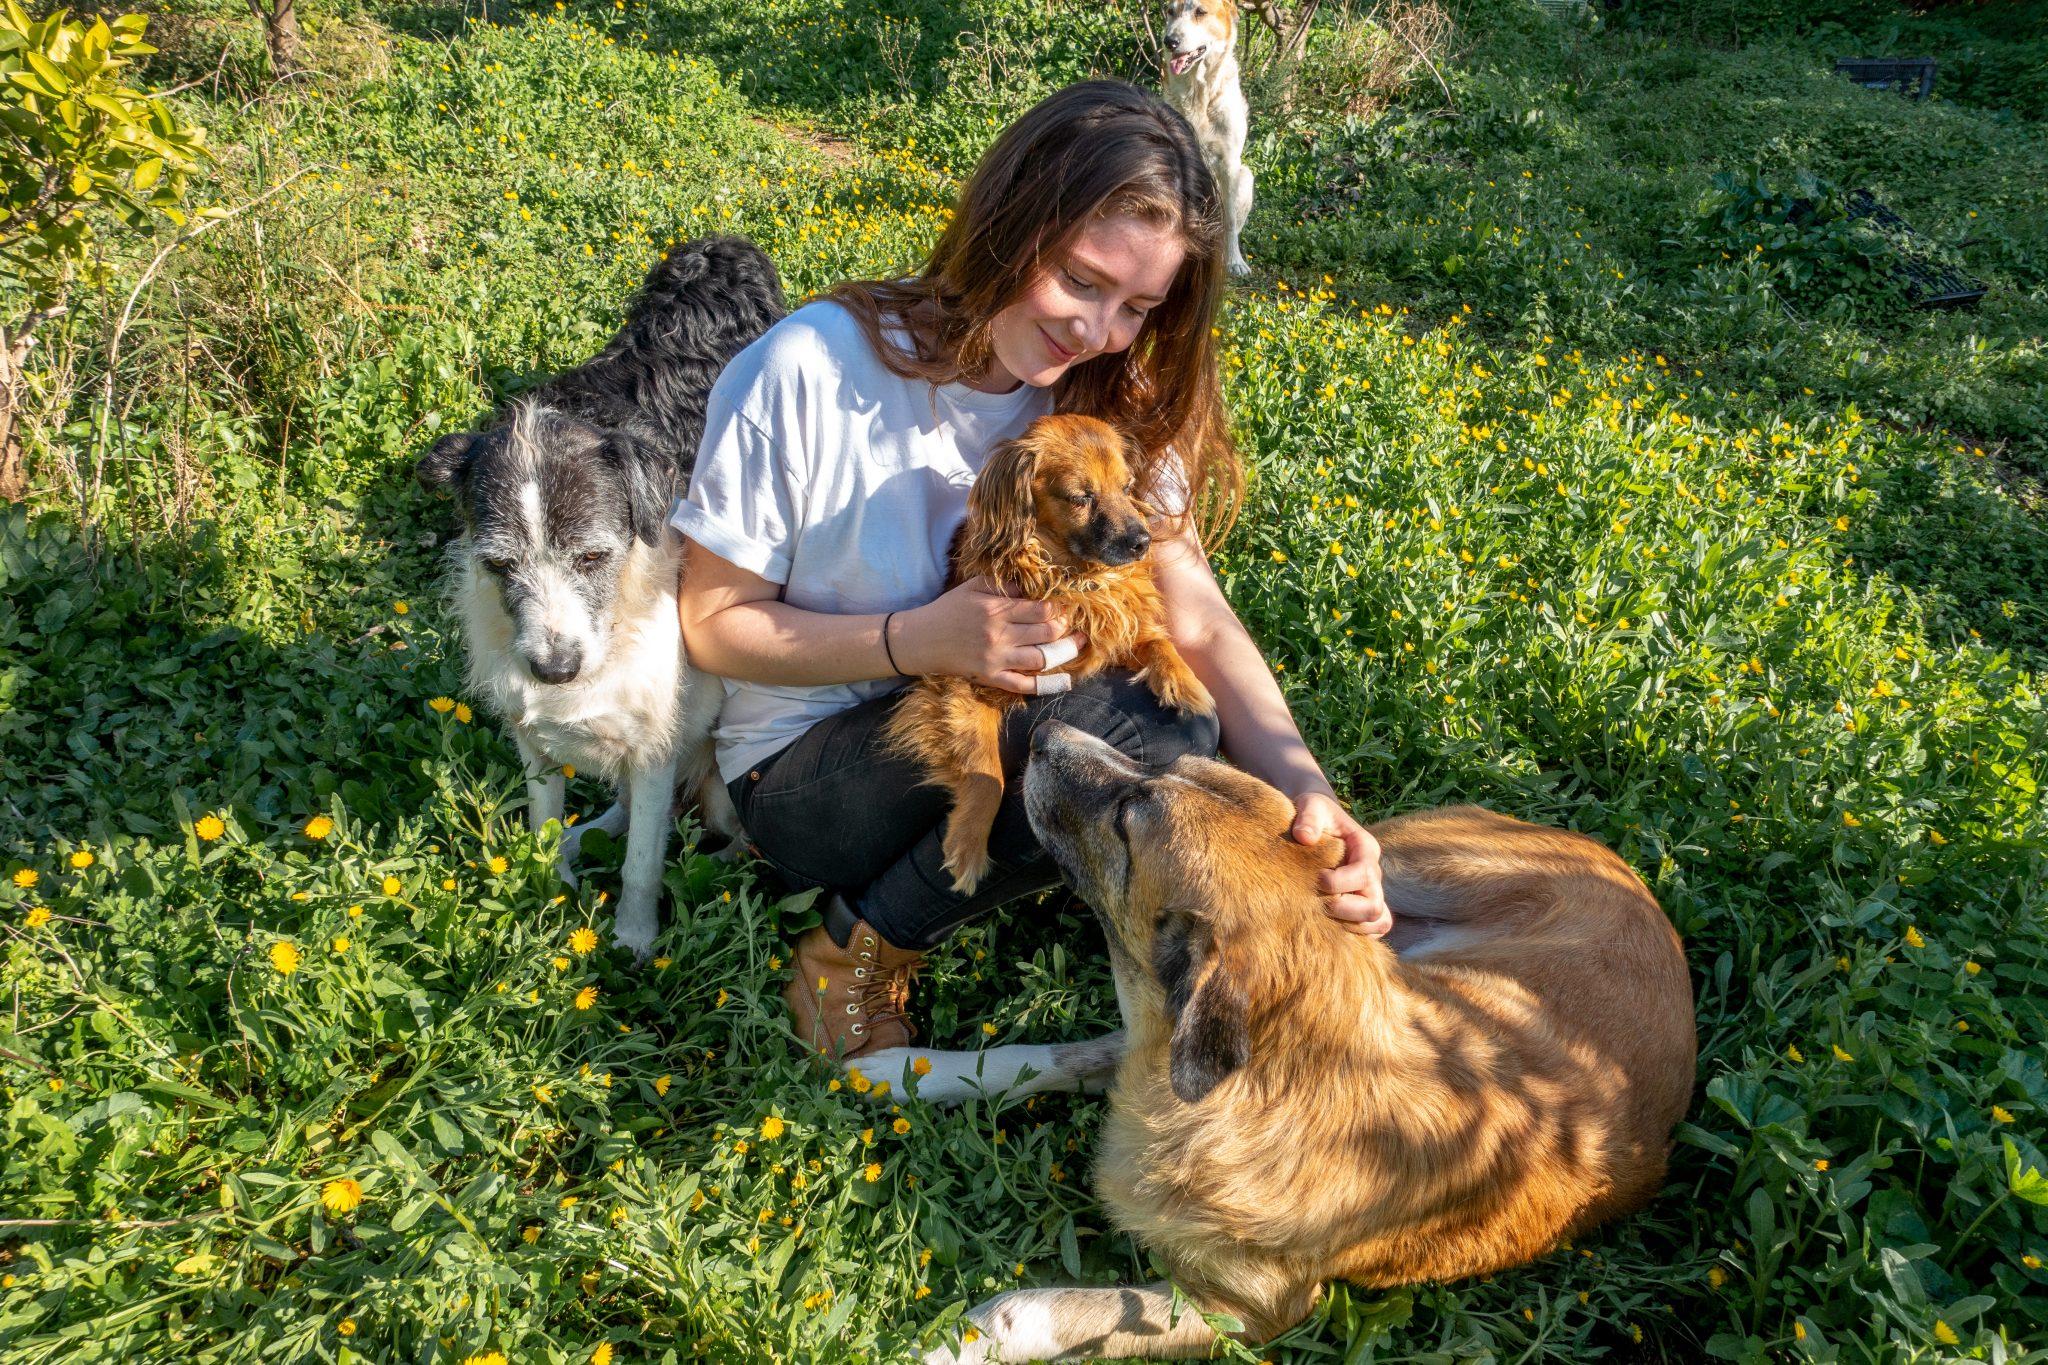 housesitting-guide-kostenlos-wohnen-andalusien-hunde